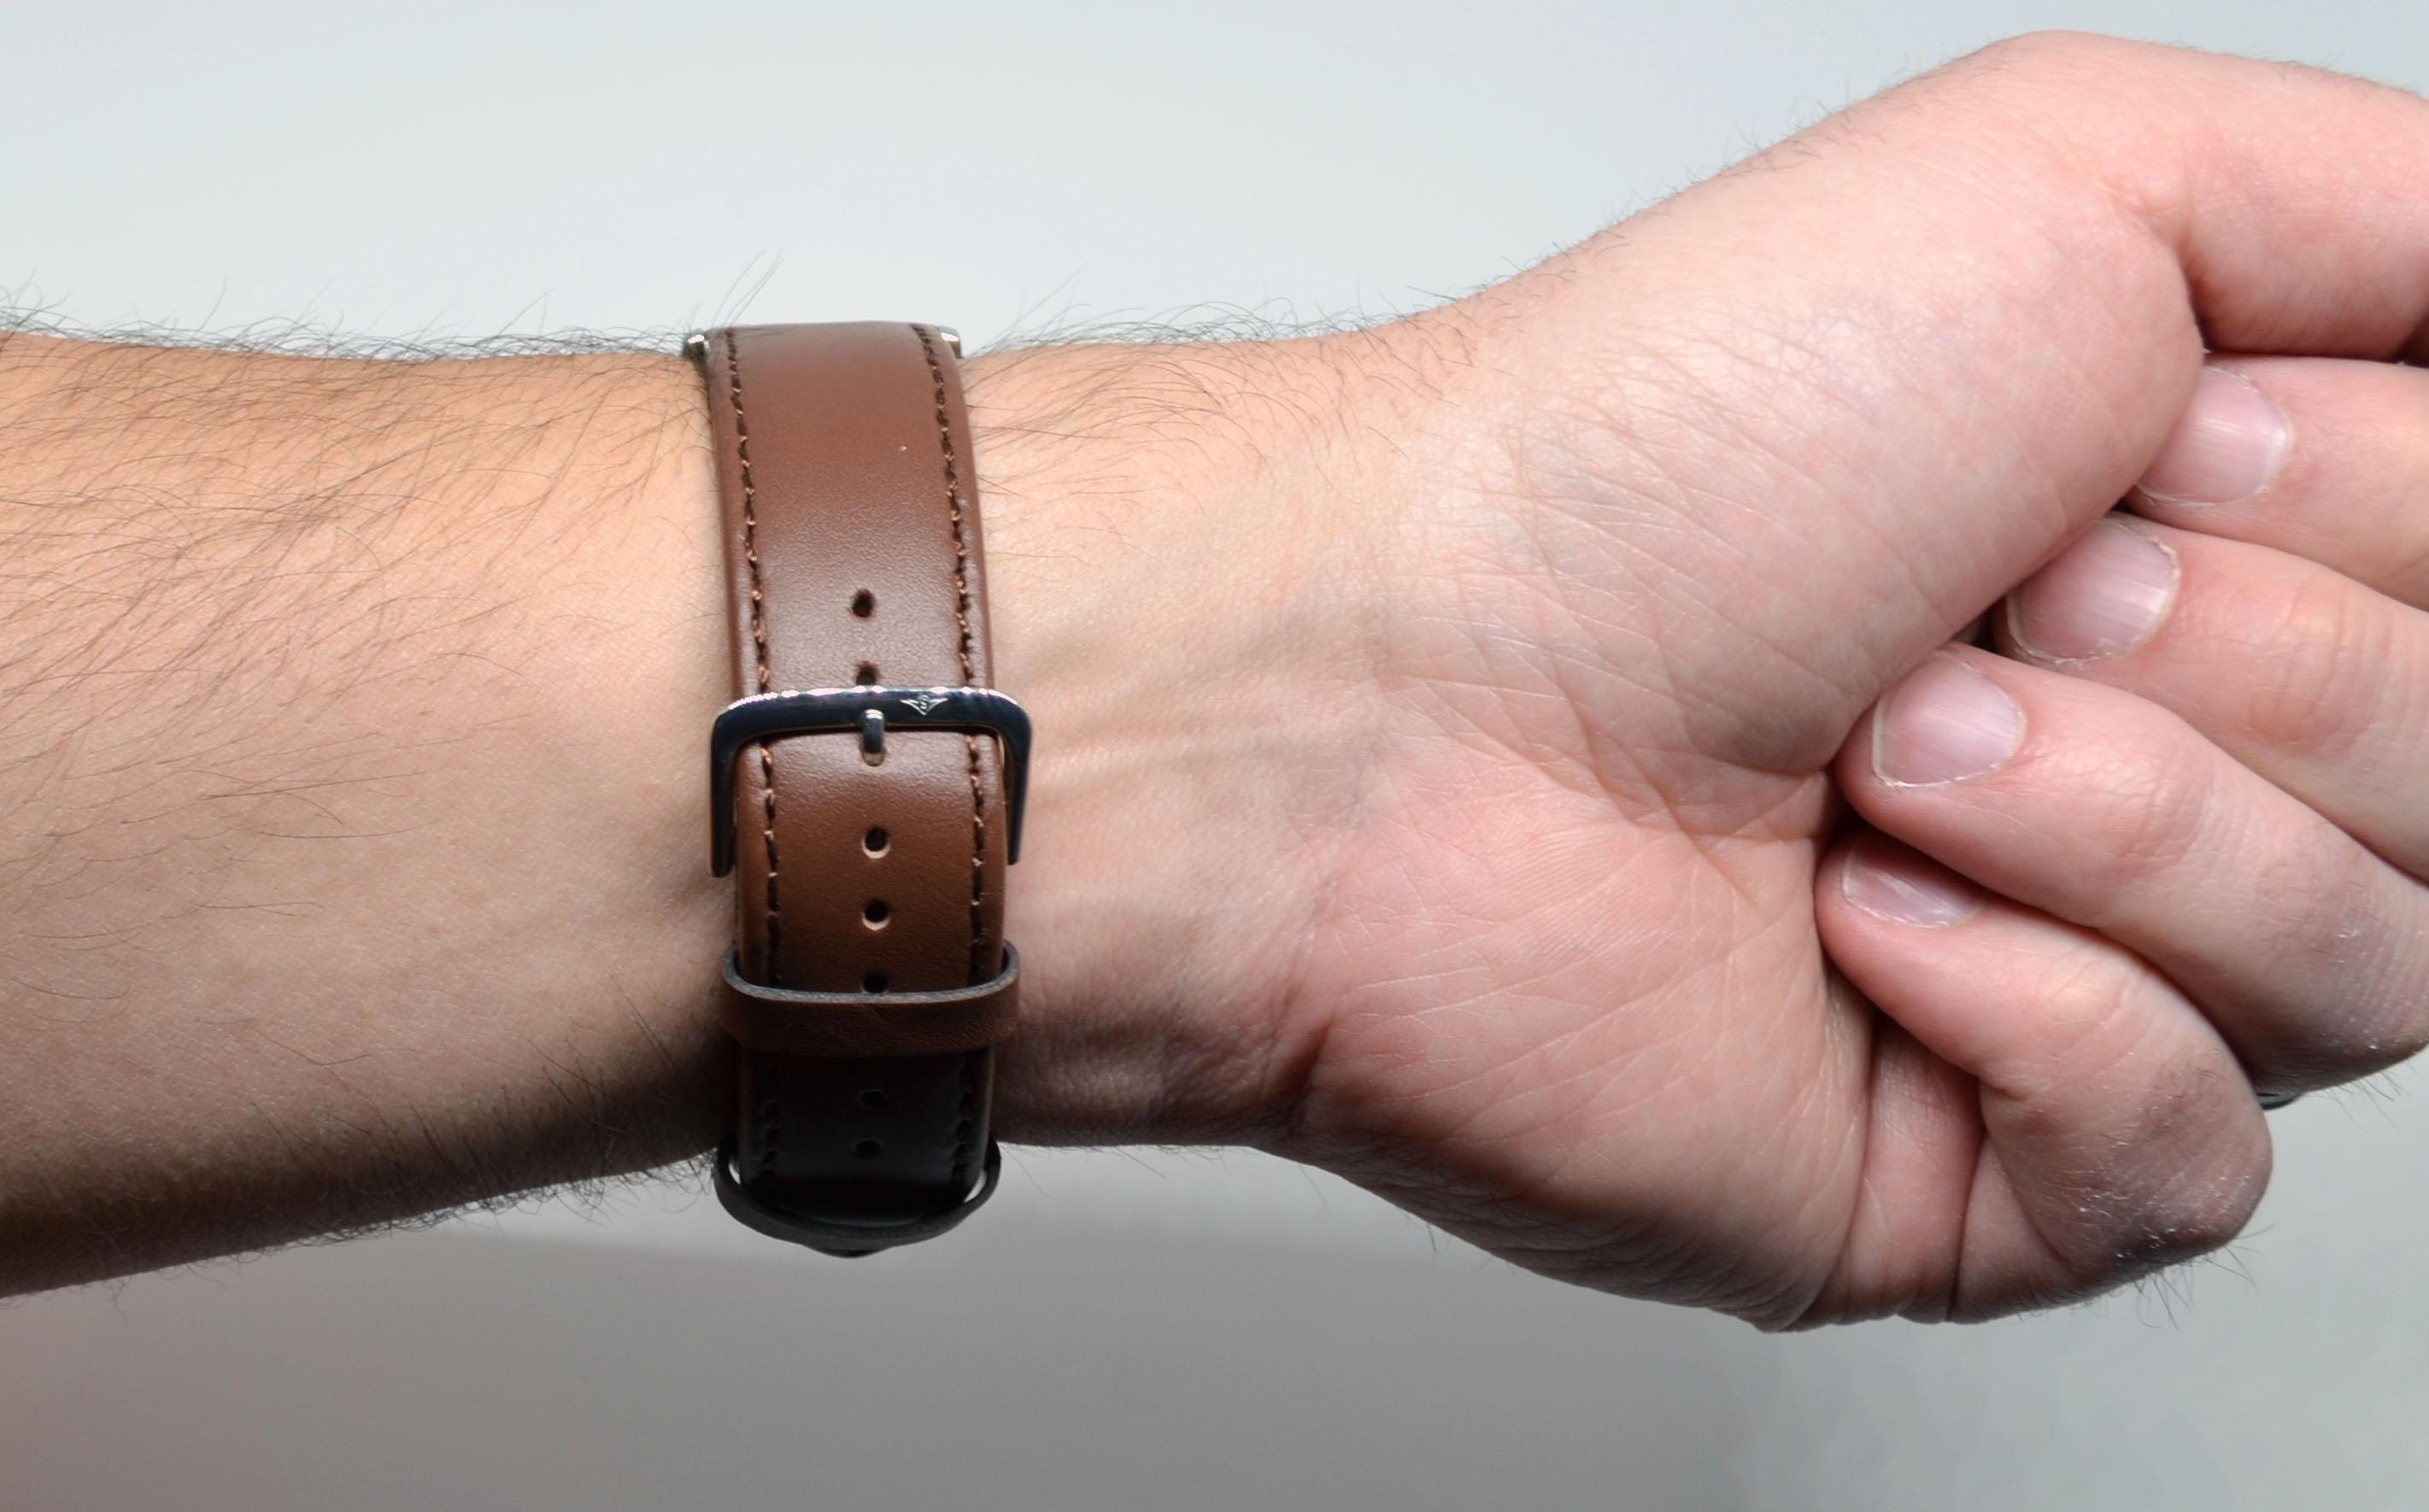 The strap when wearing it.